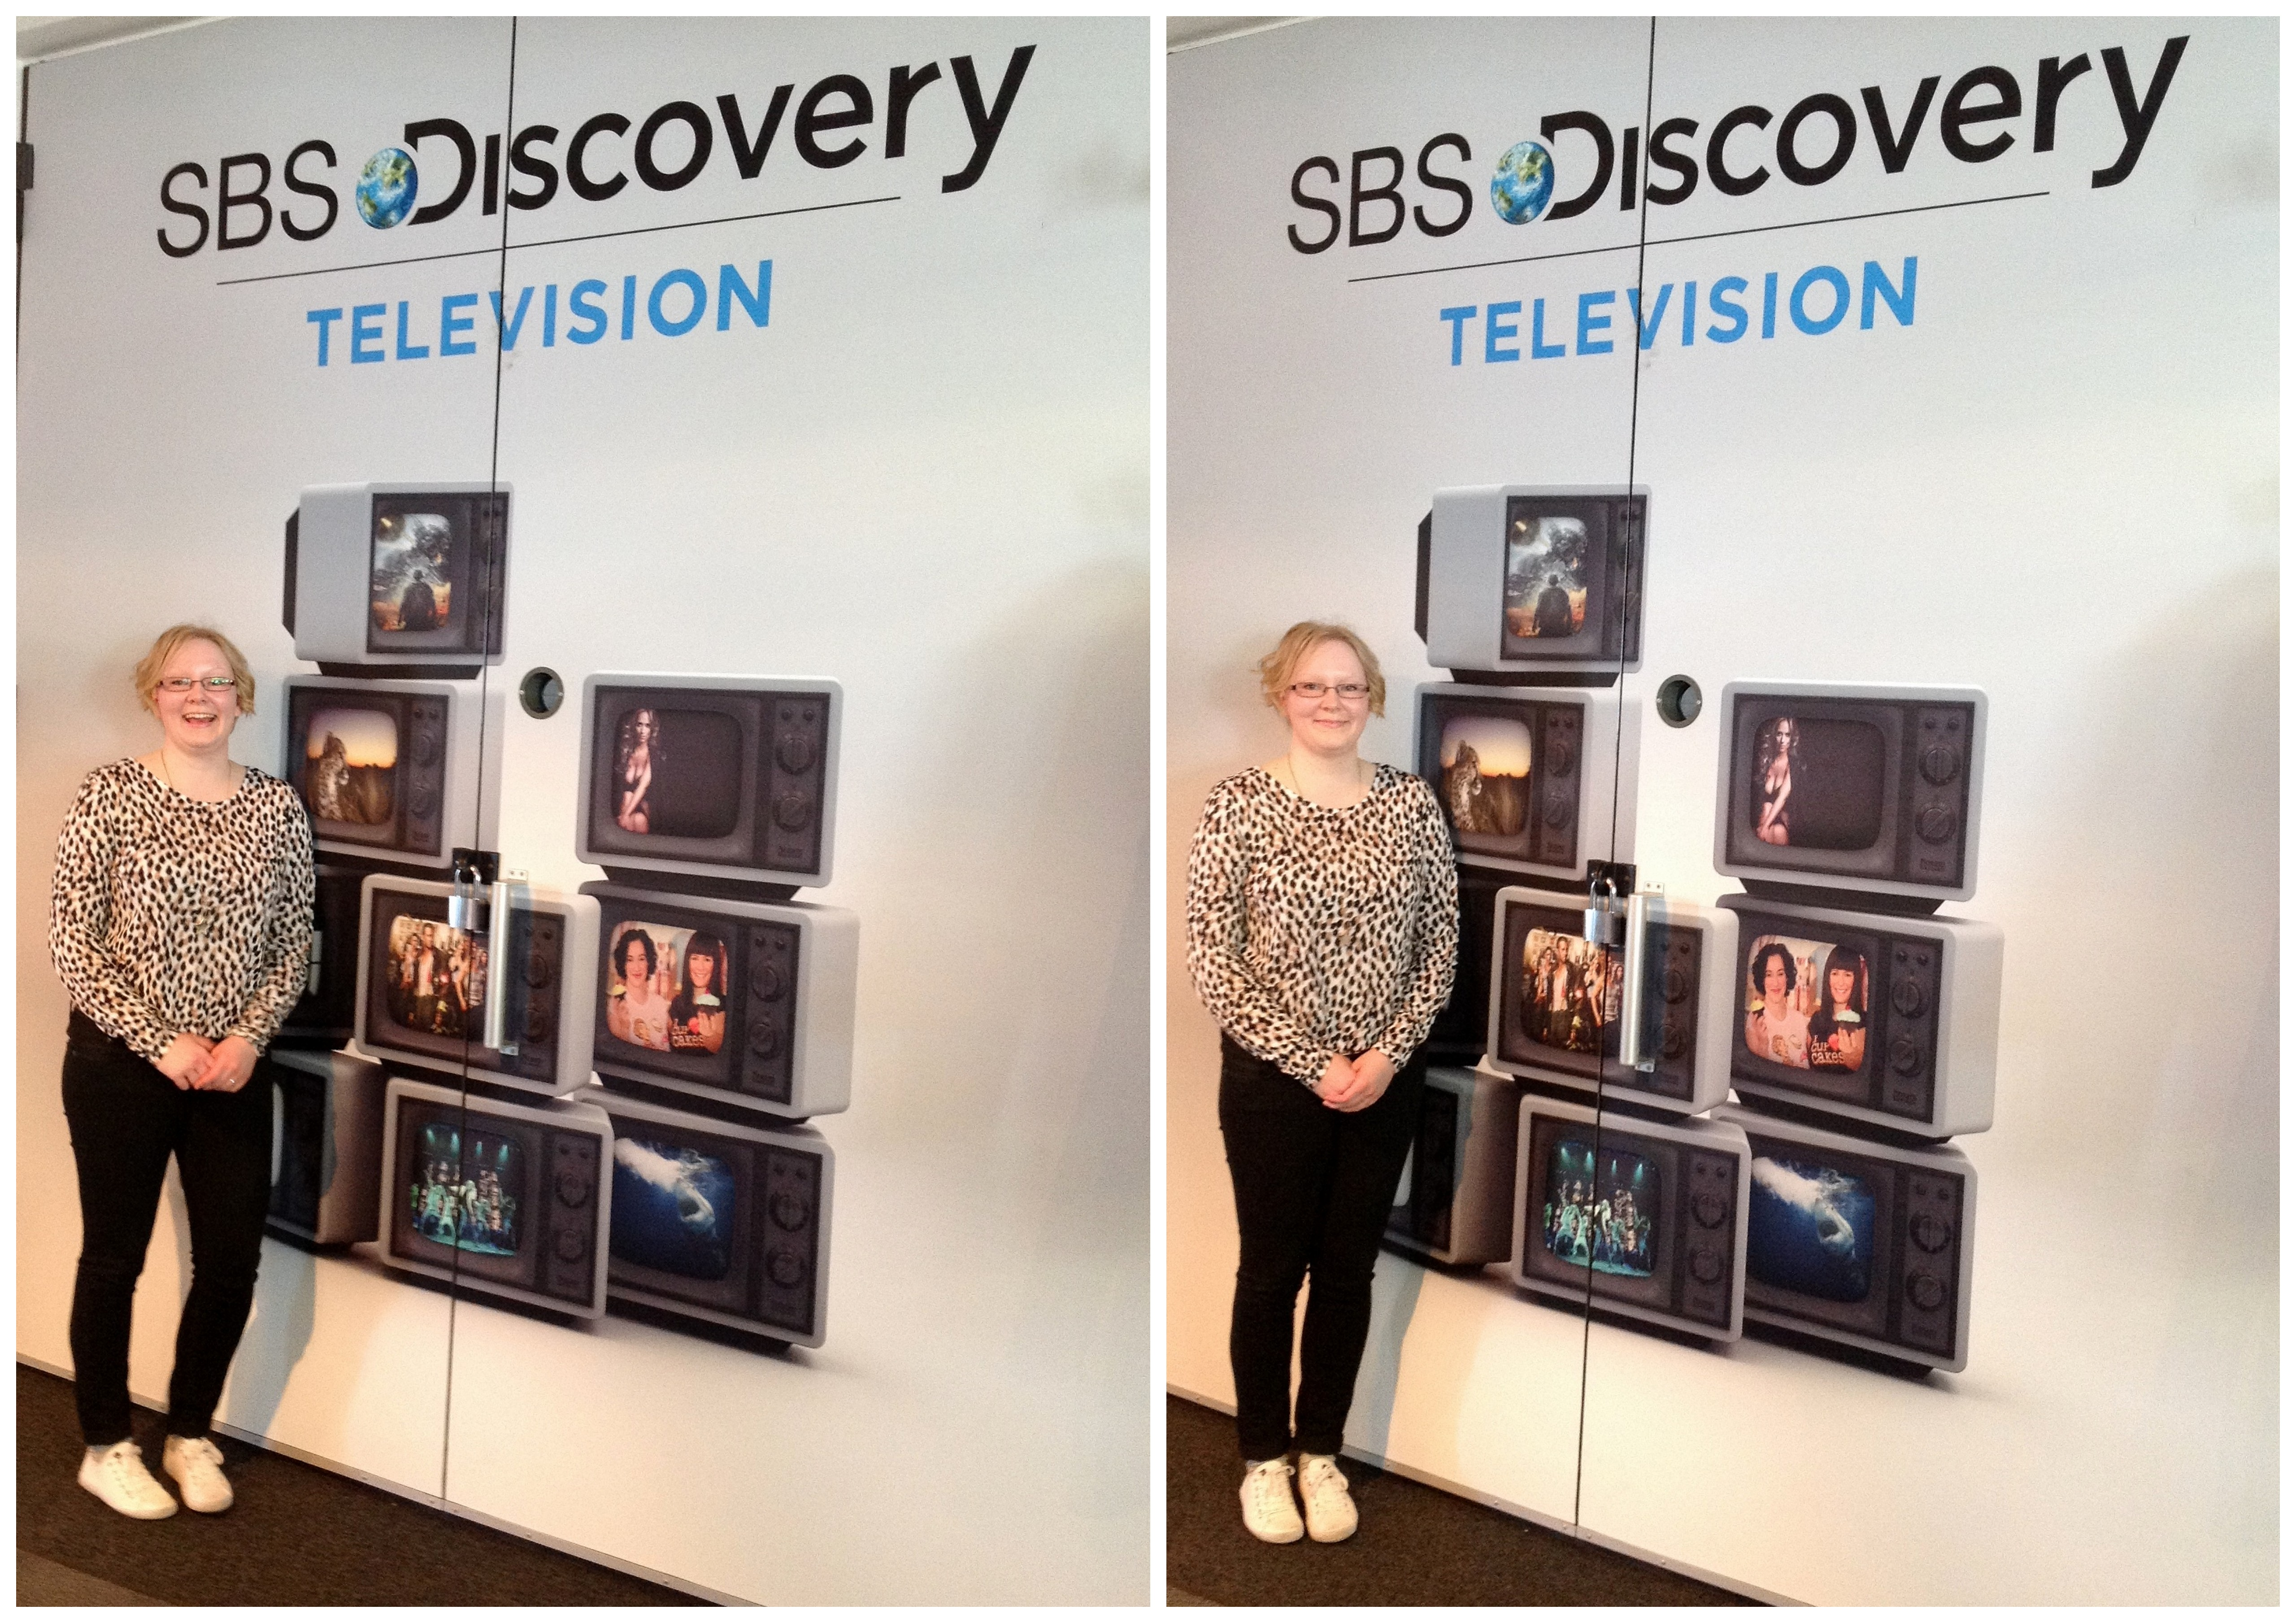 sbs_discovery.jpg